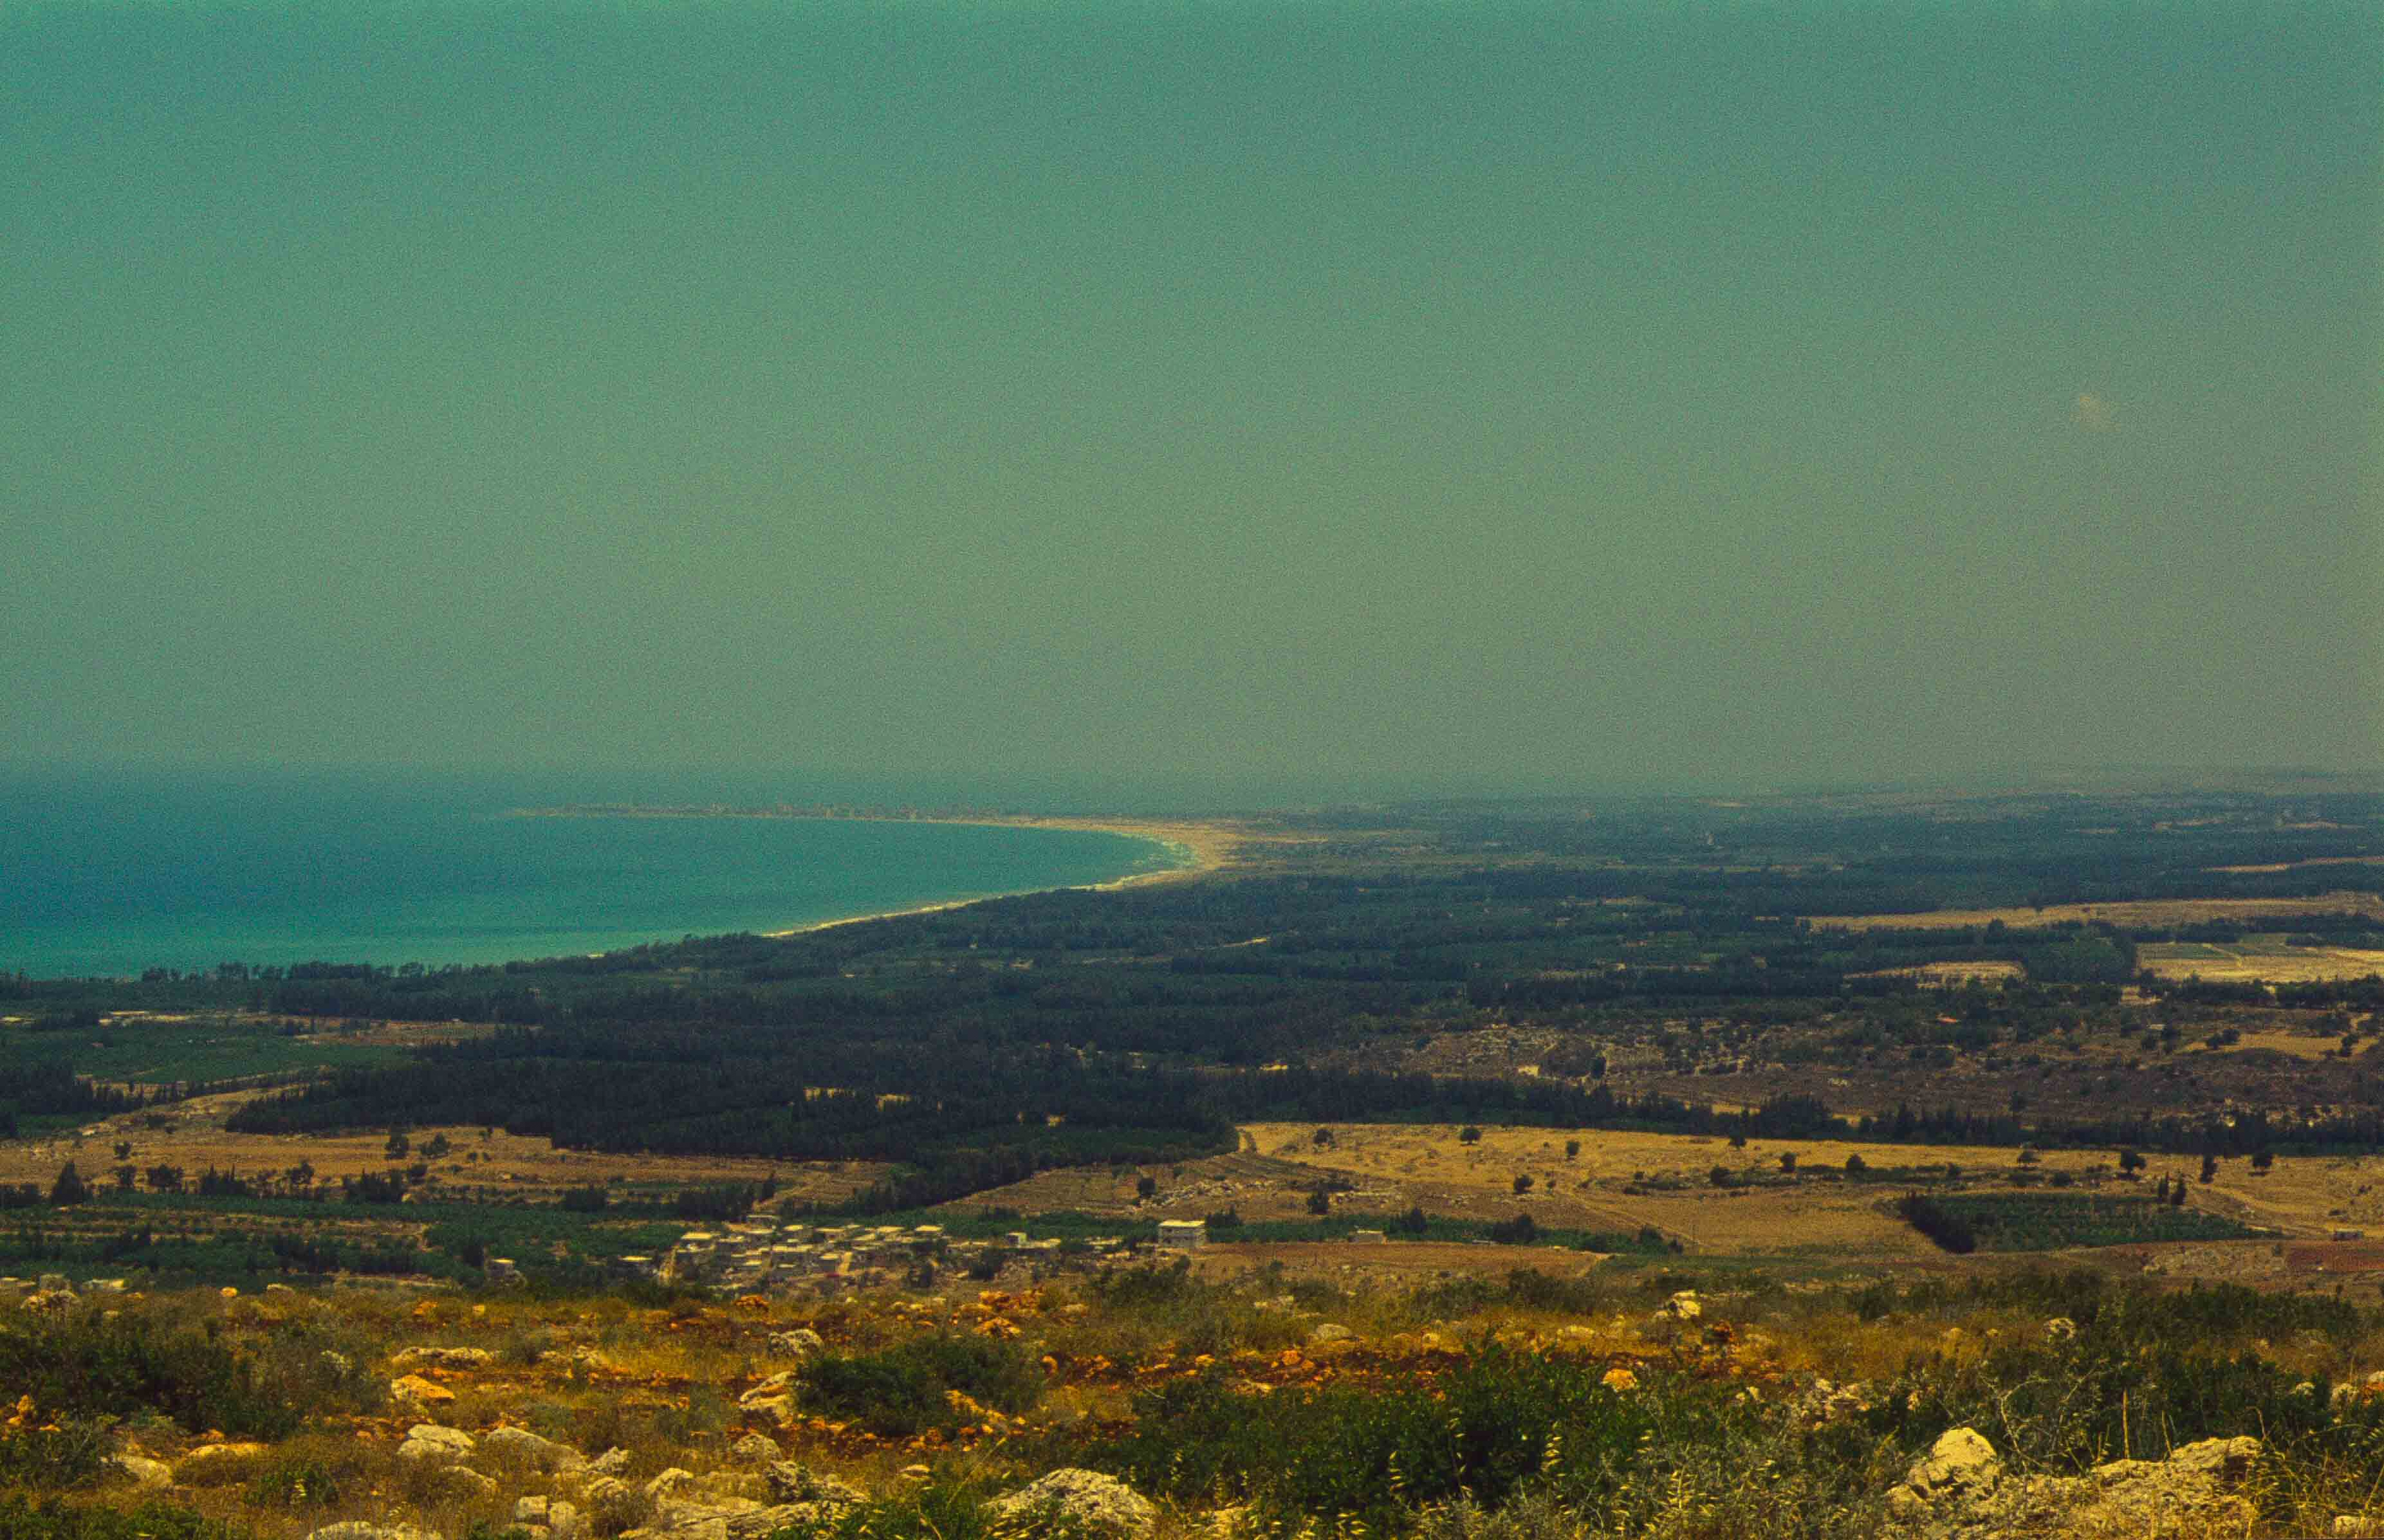 104. Libanon